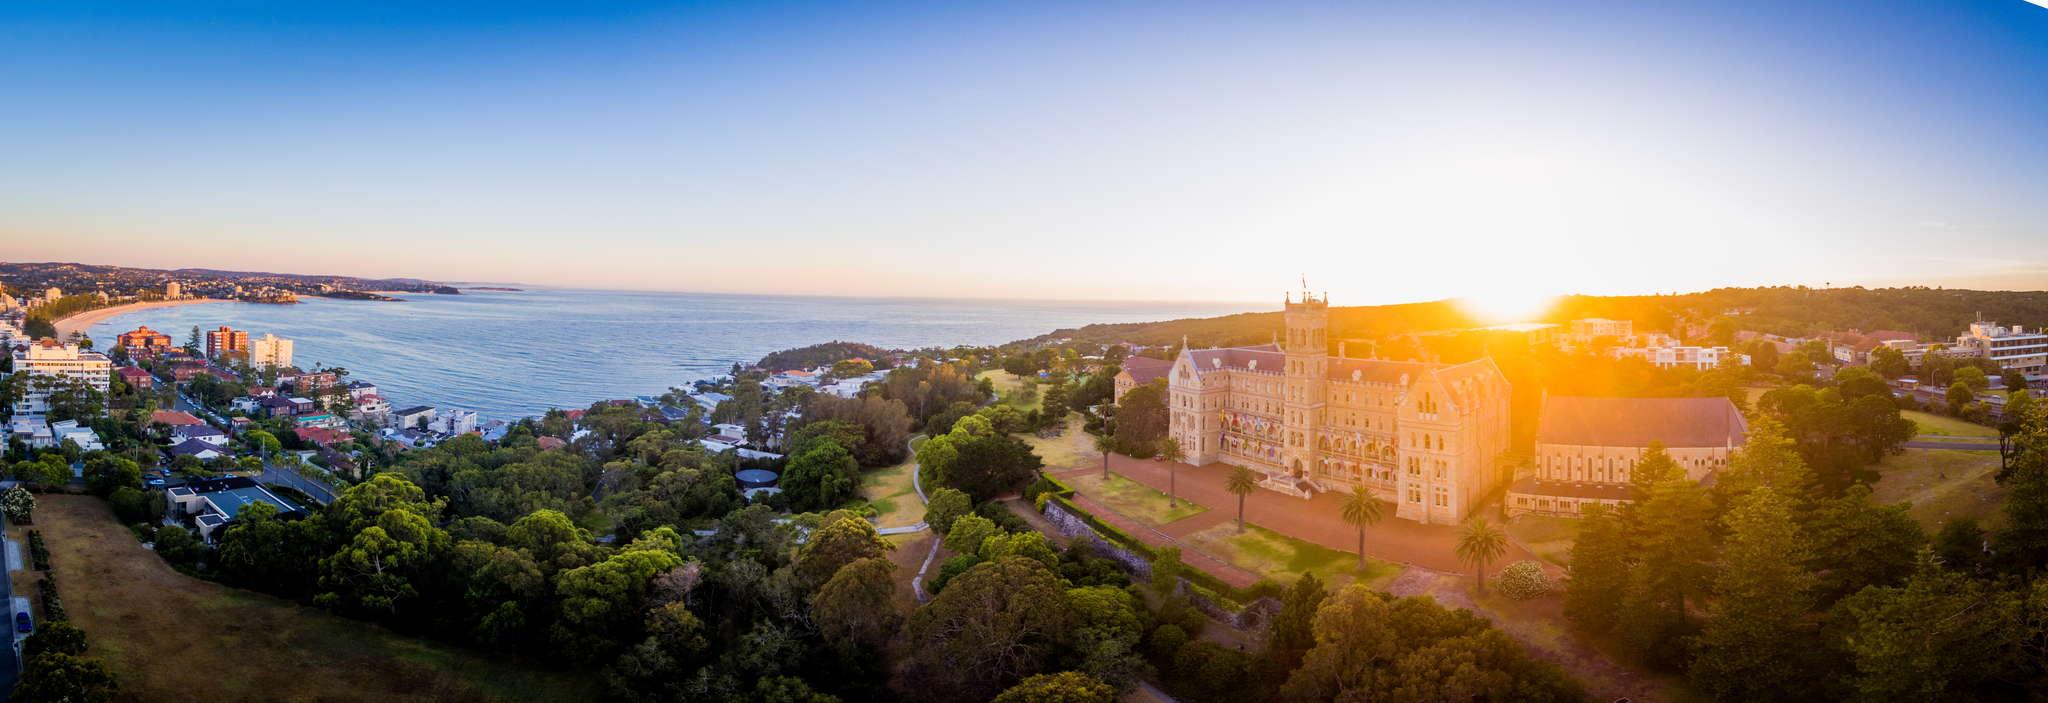 International_College_of_Management_Sydney_Pana_161202_ICMSMANLY-056